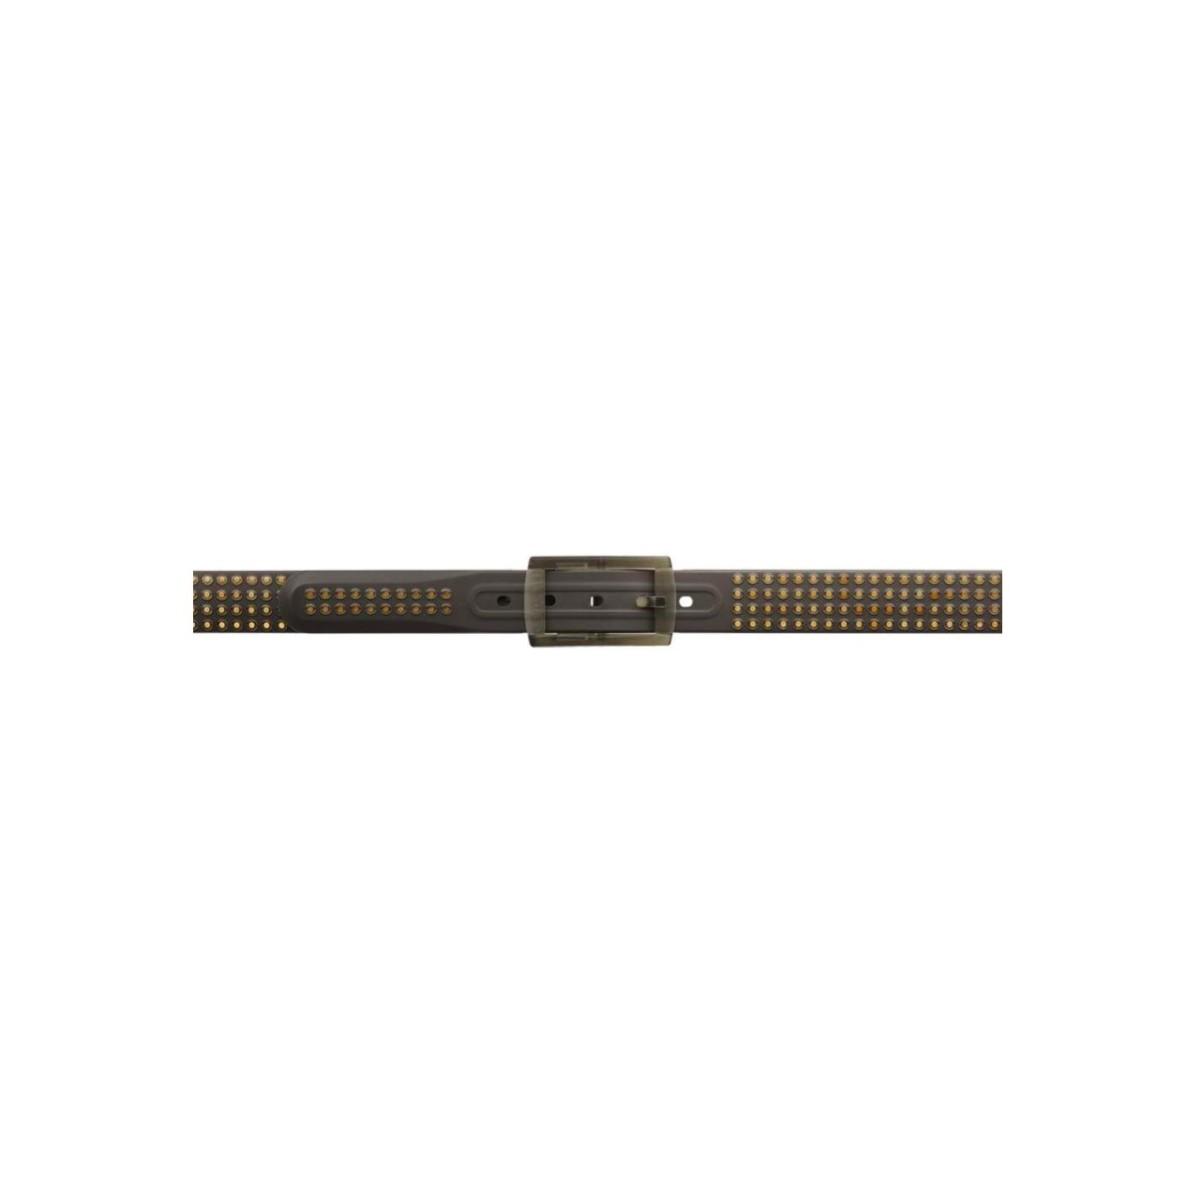 Cintura Tie-ups - Cintura basic glam pins borchiata